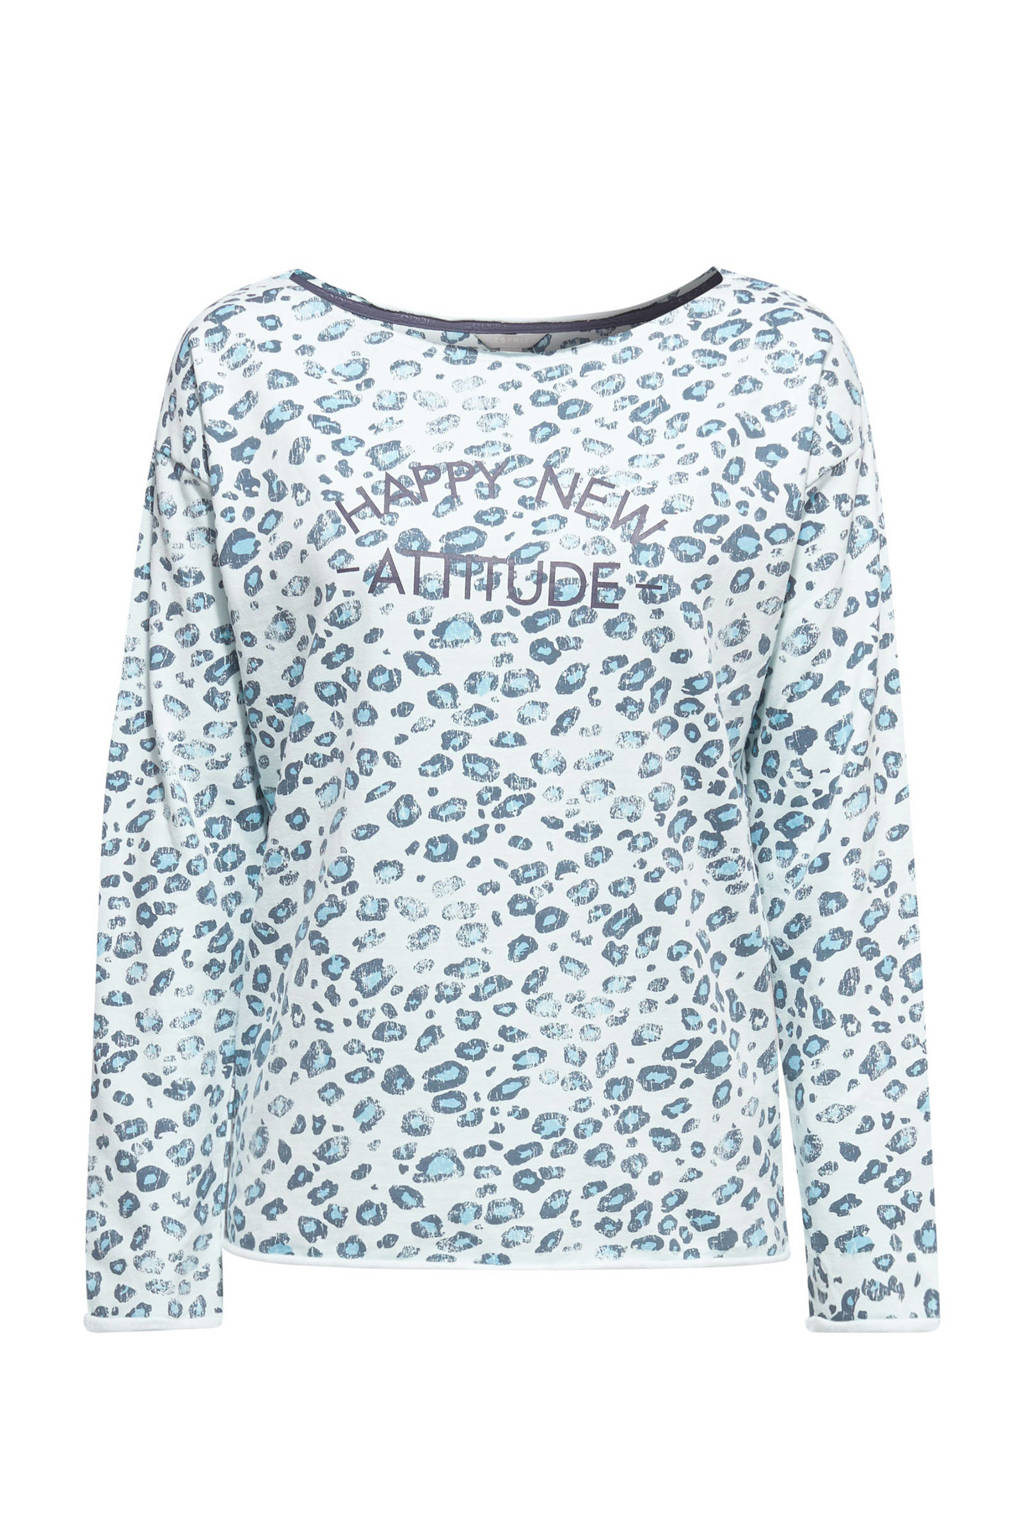 ESPRIT Women Sports sweater blauw/wit, Wit/blauw